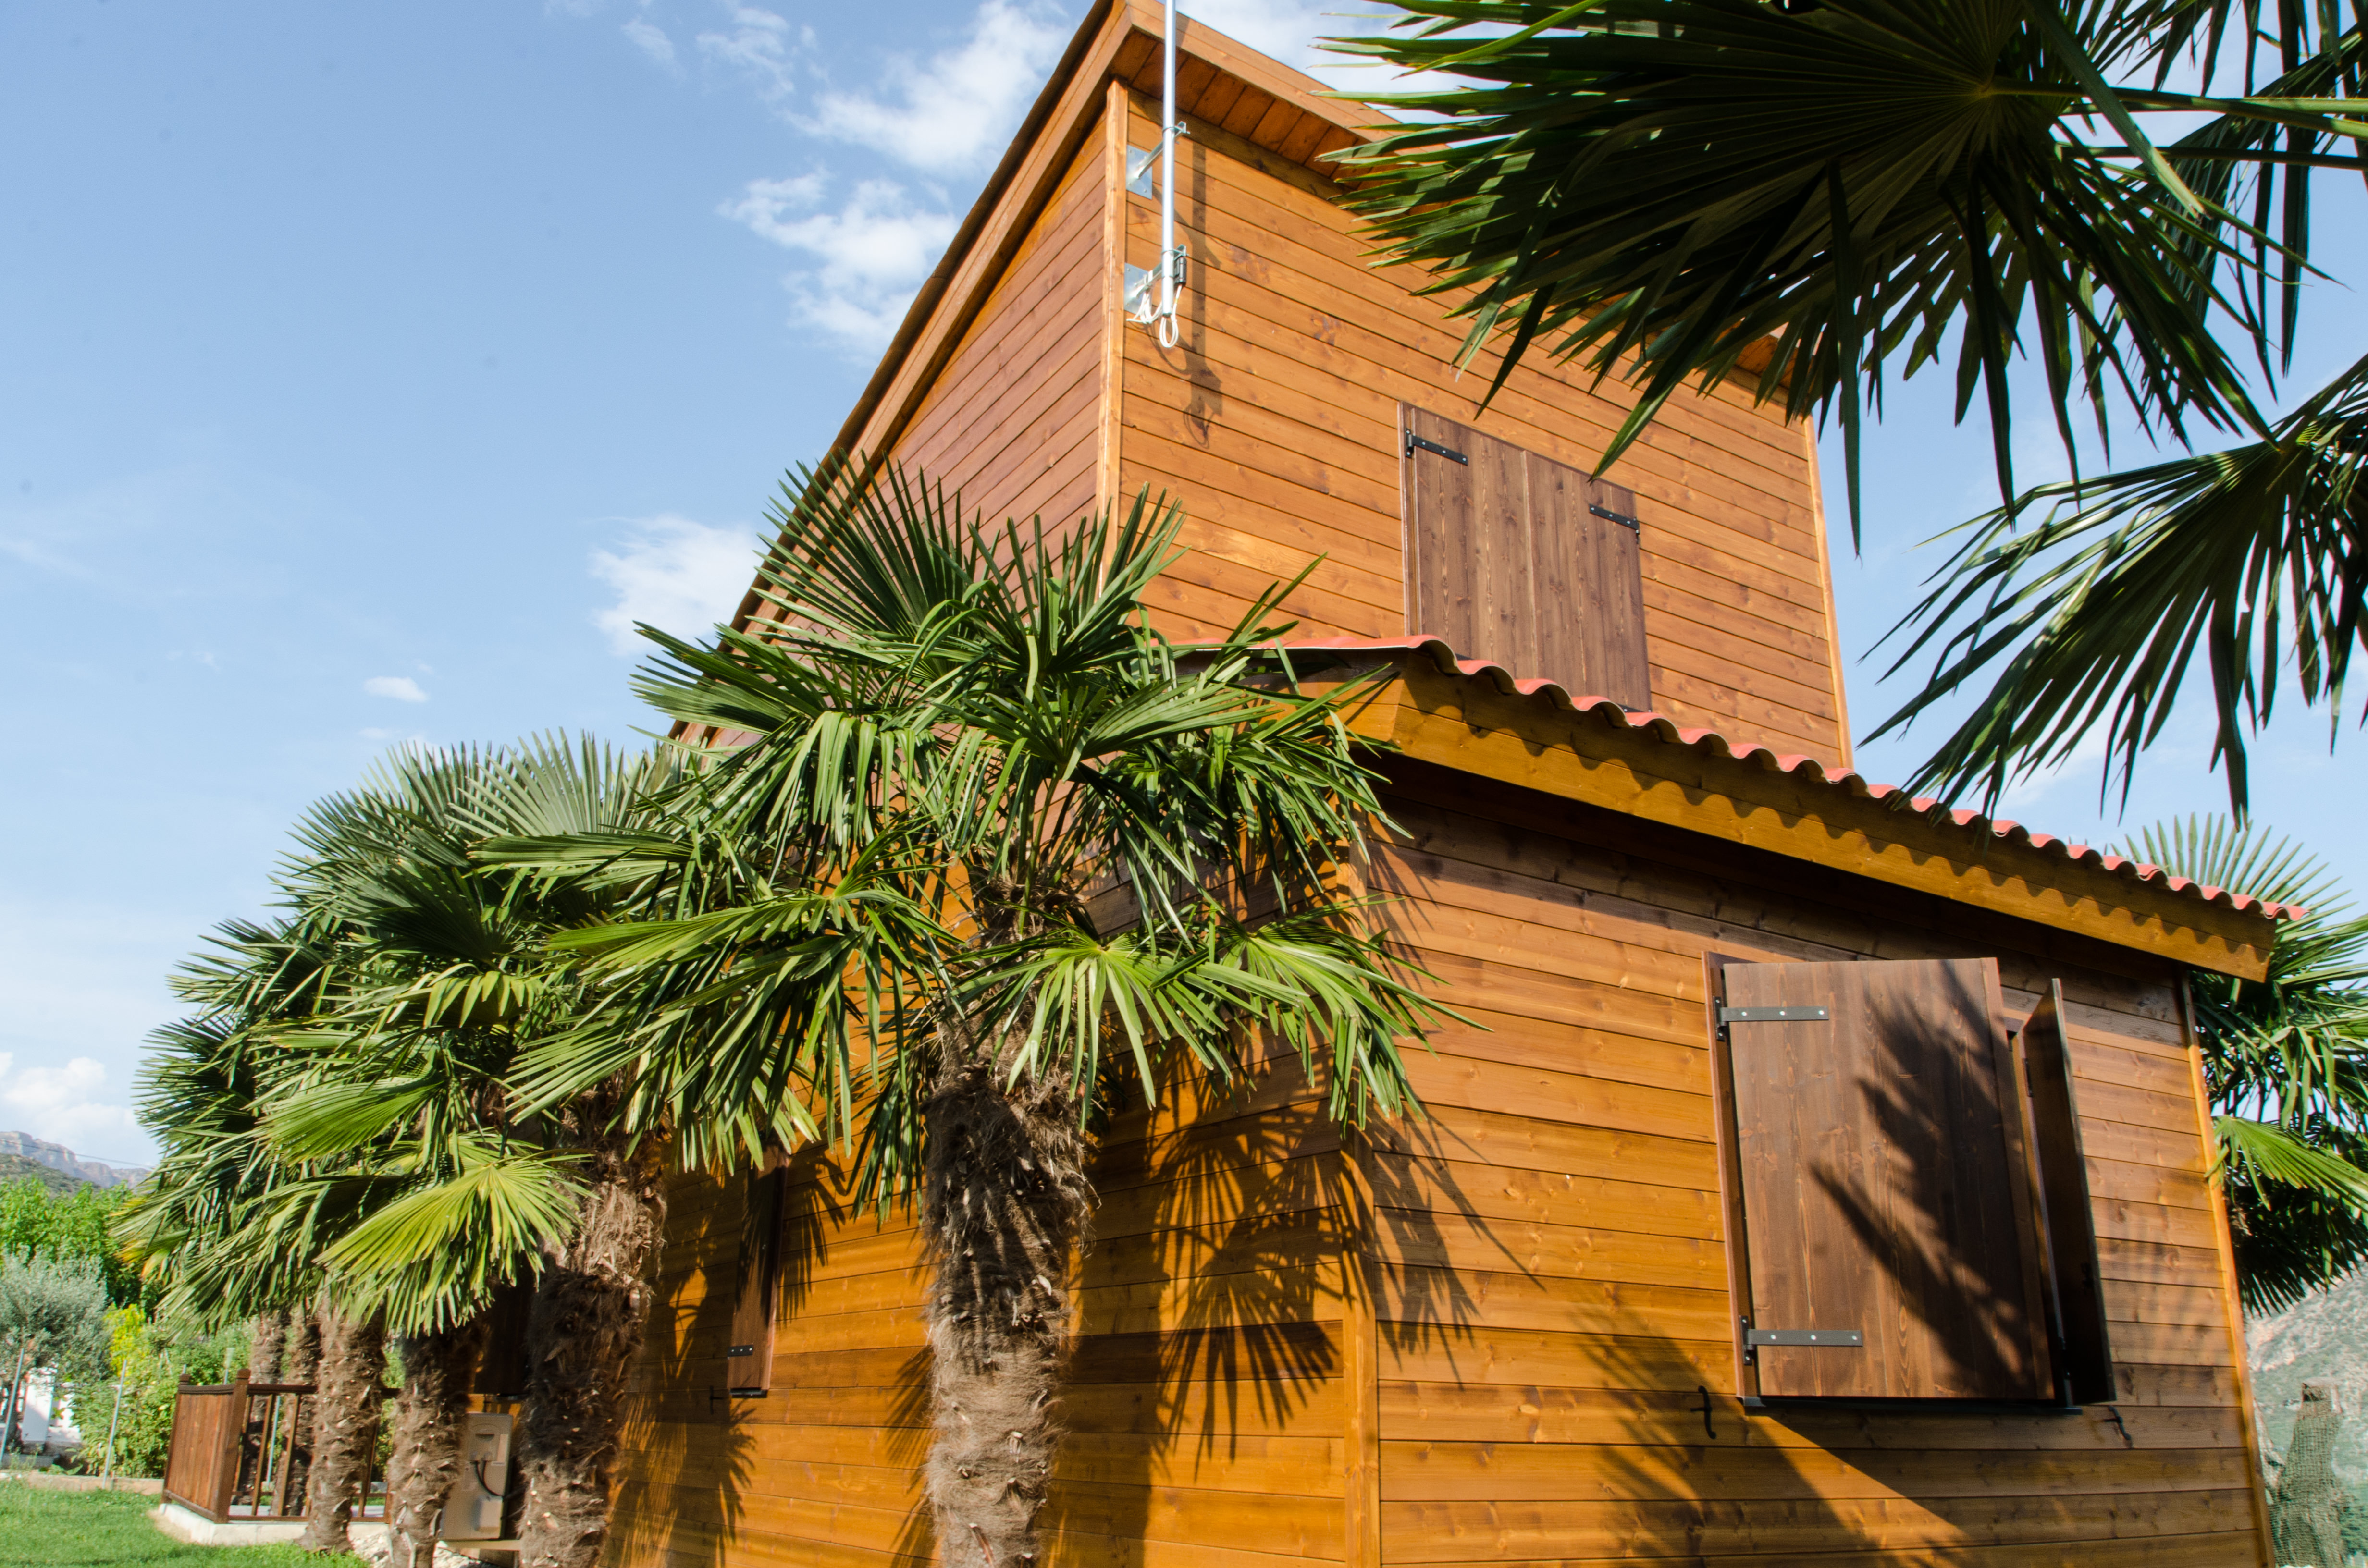 exterior cabaña de madera